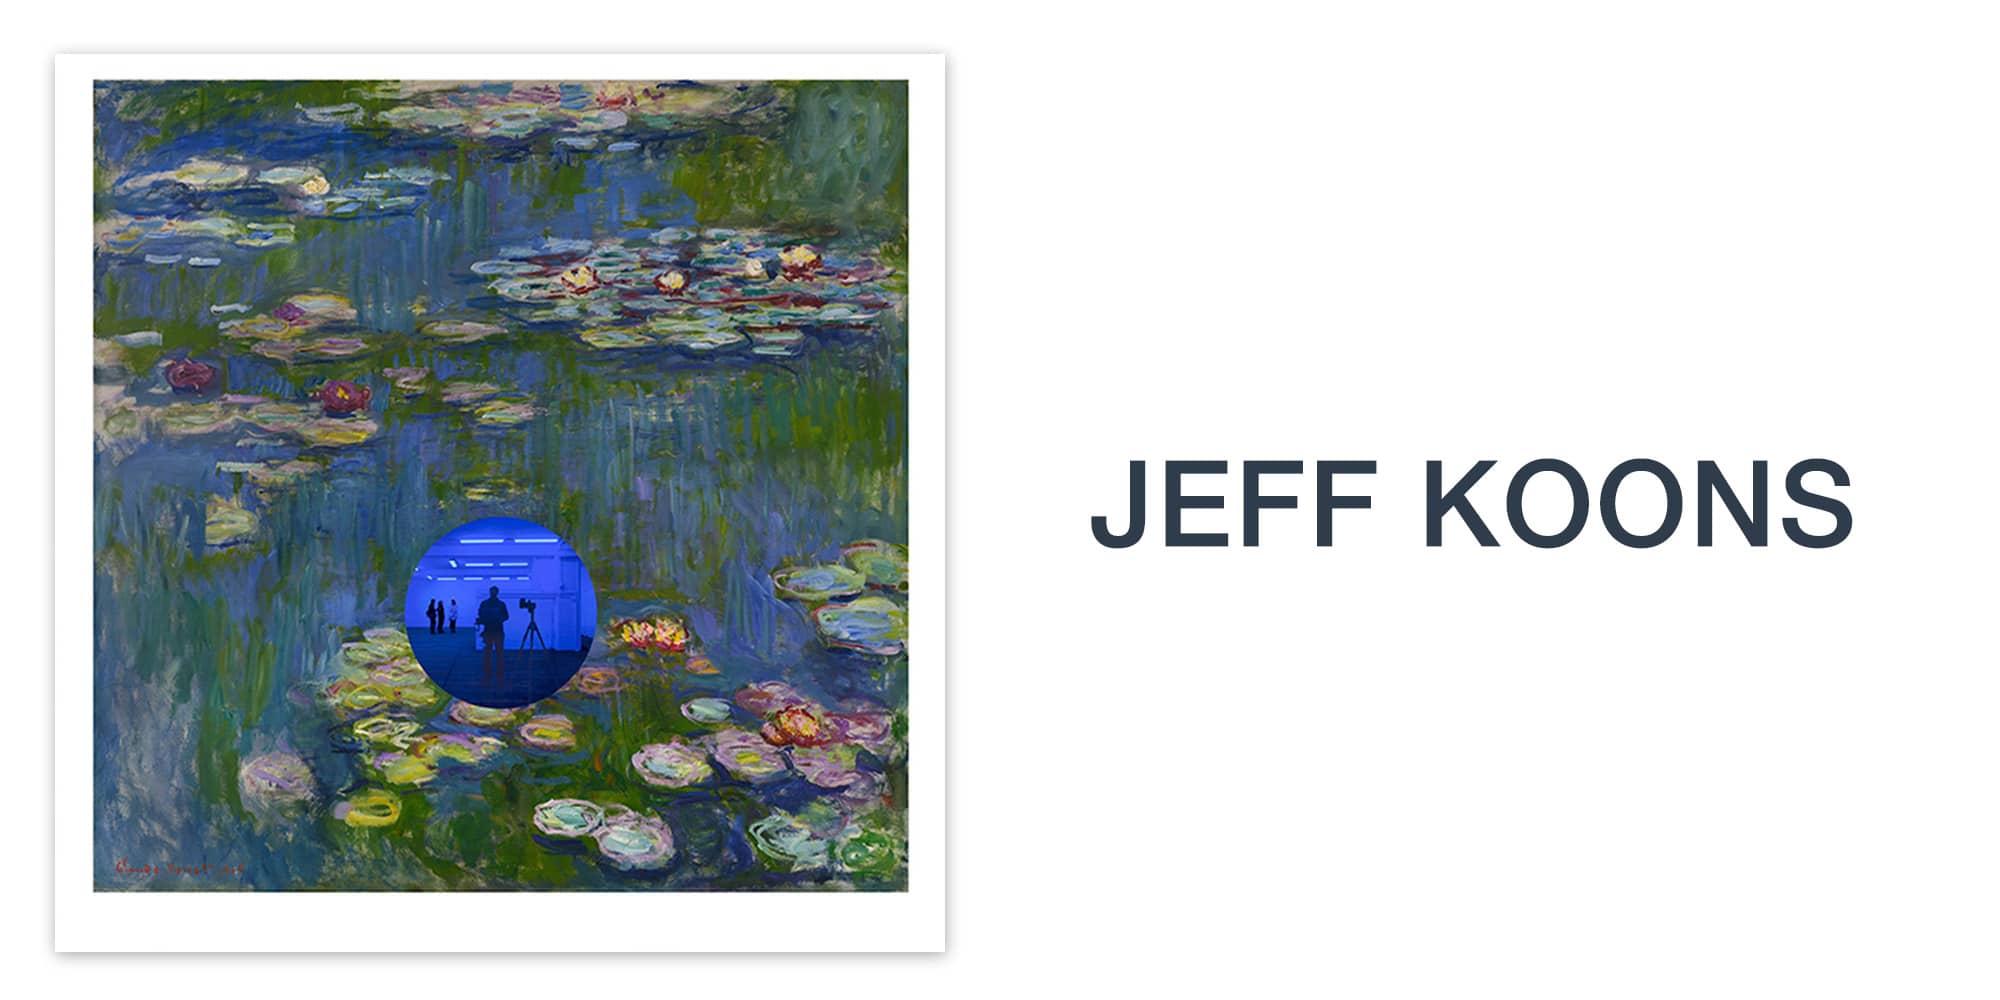 Jeff Koons Print for Art Miami Slide Show